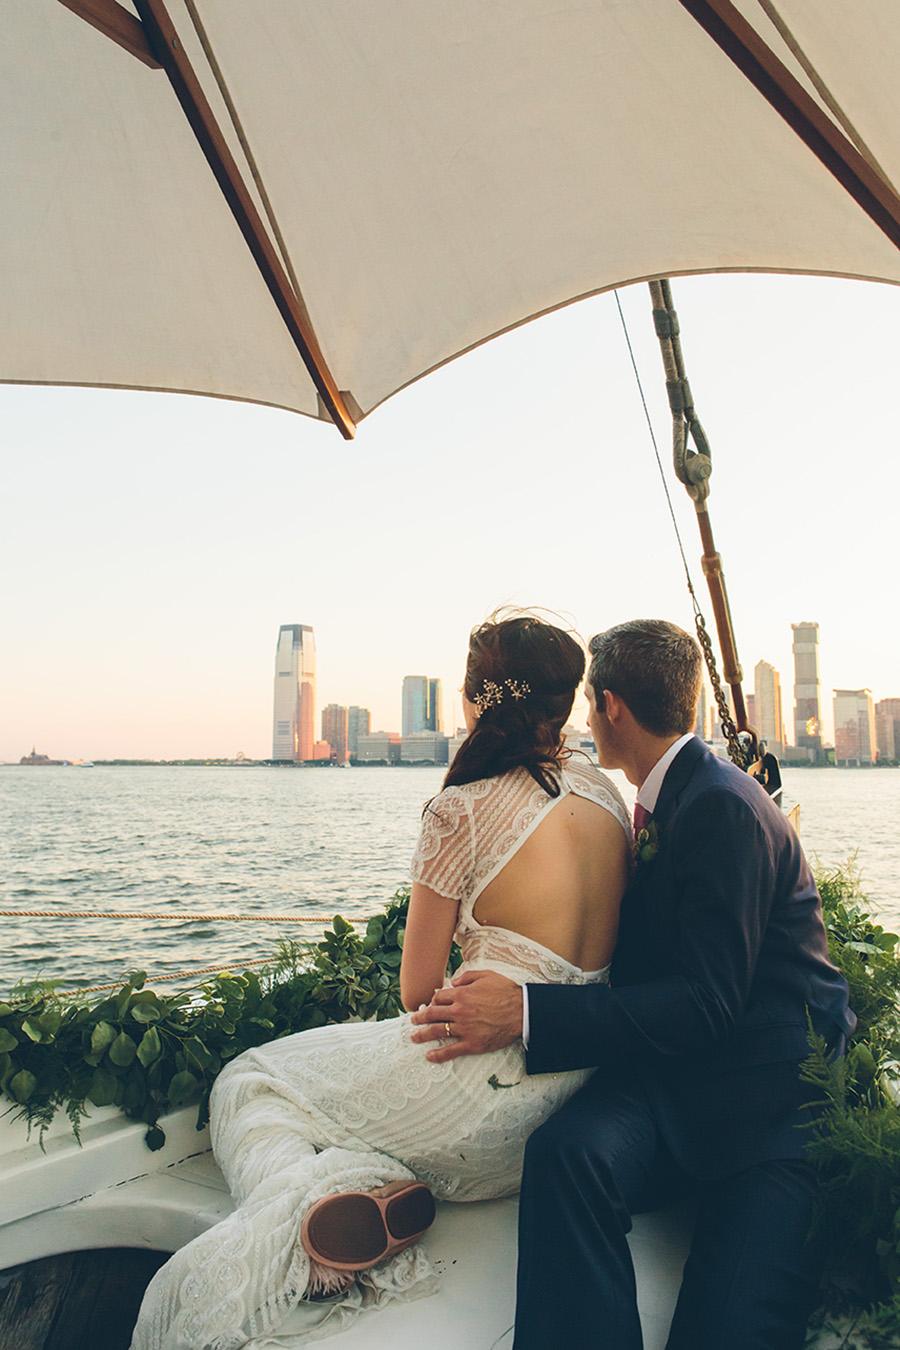 NEW-YORK-CITY-WEDDING-PHOTOGRAPHER-WEST-VILLAGE-GREENWICH-HOTEL-GRAND-BANKS-PIER-0098.jpg